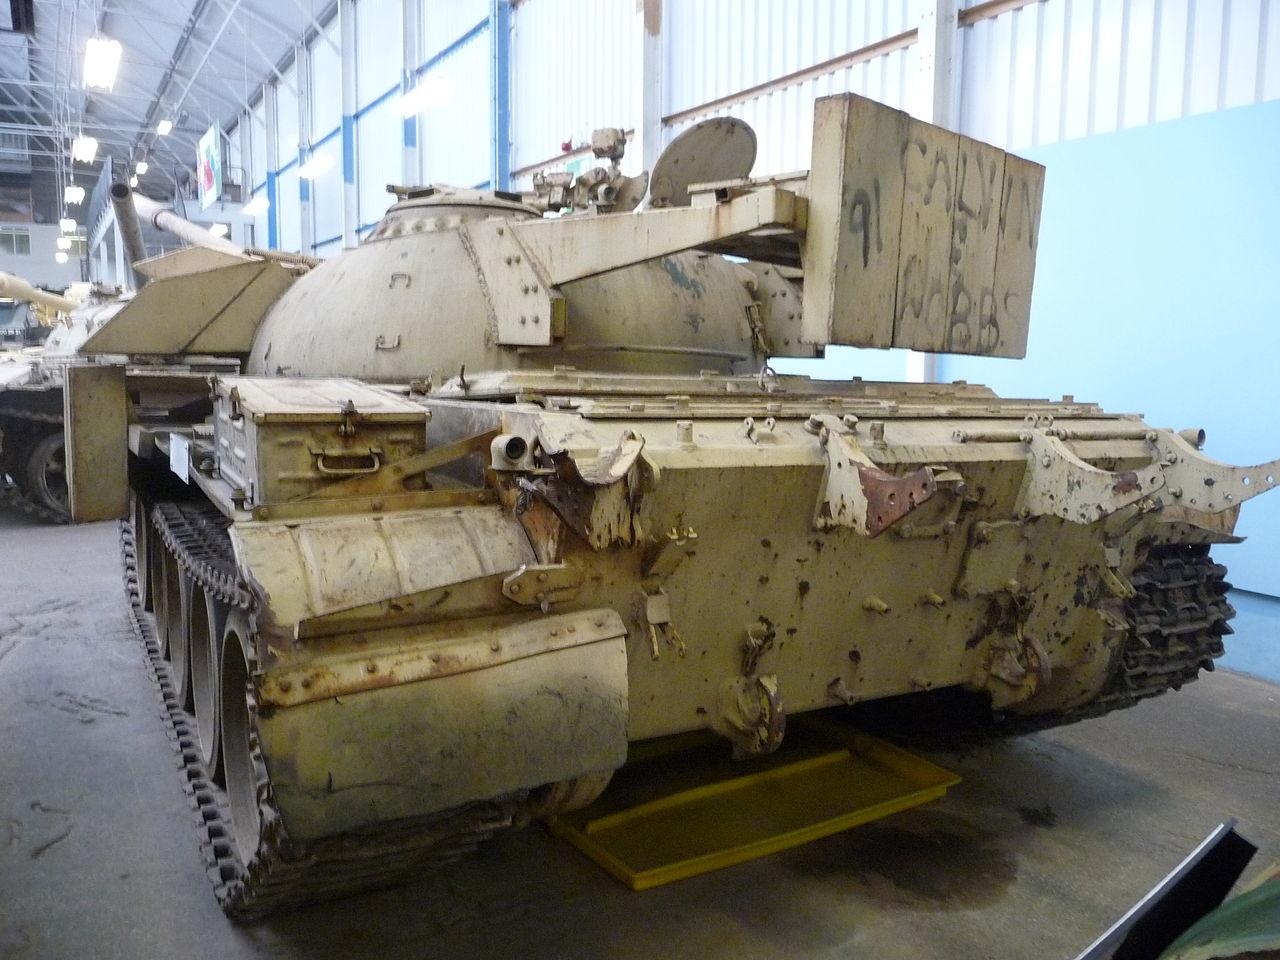 1280px-T-55_Enigma_tank_at_the_Bovington